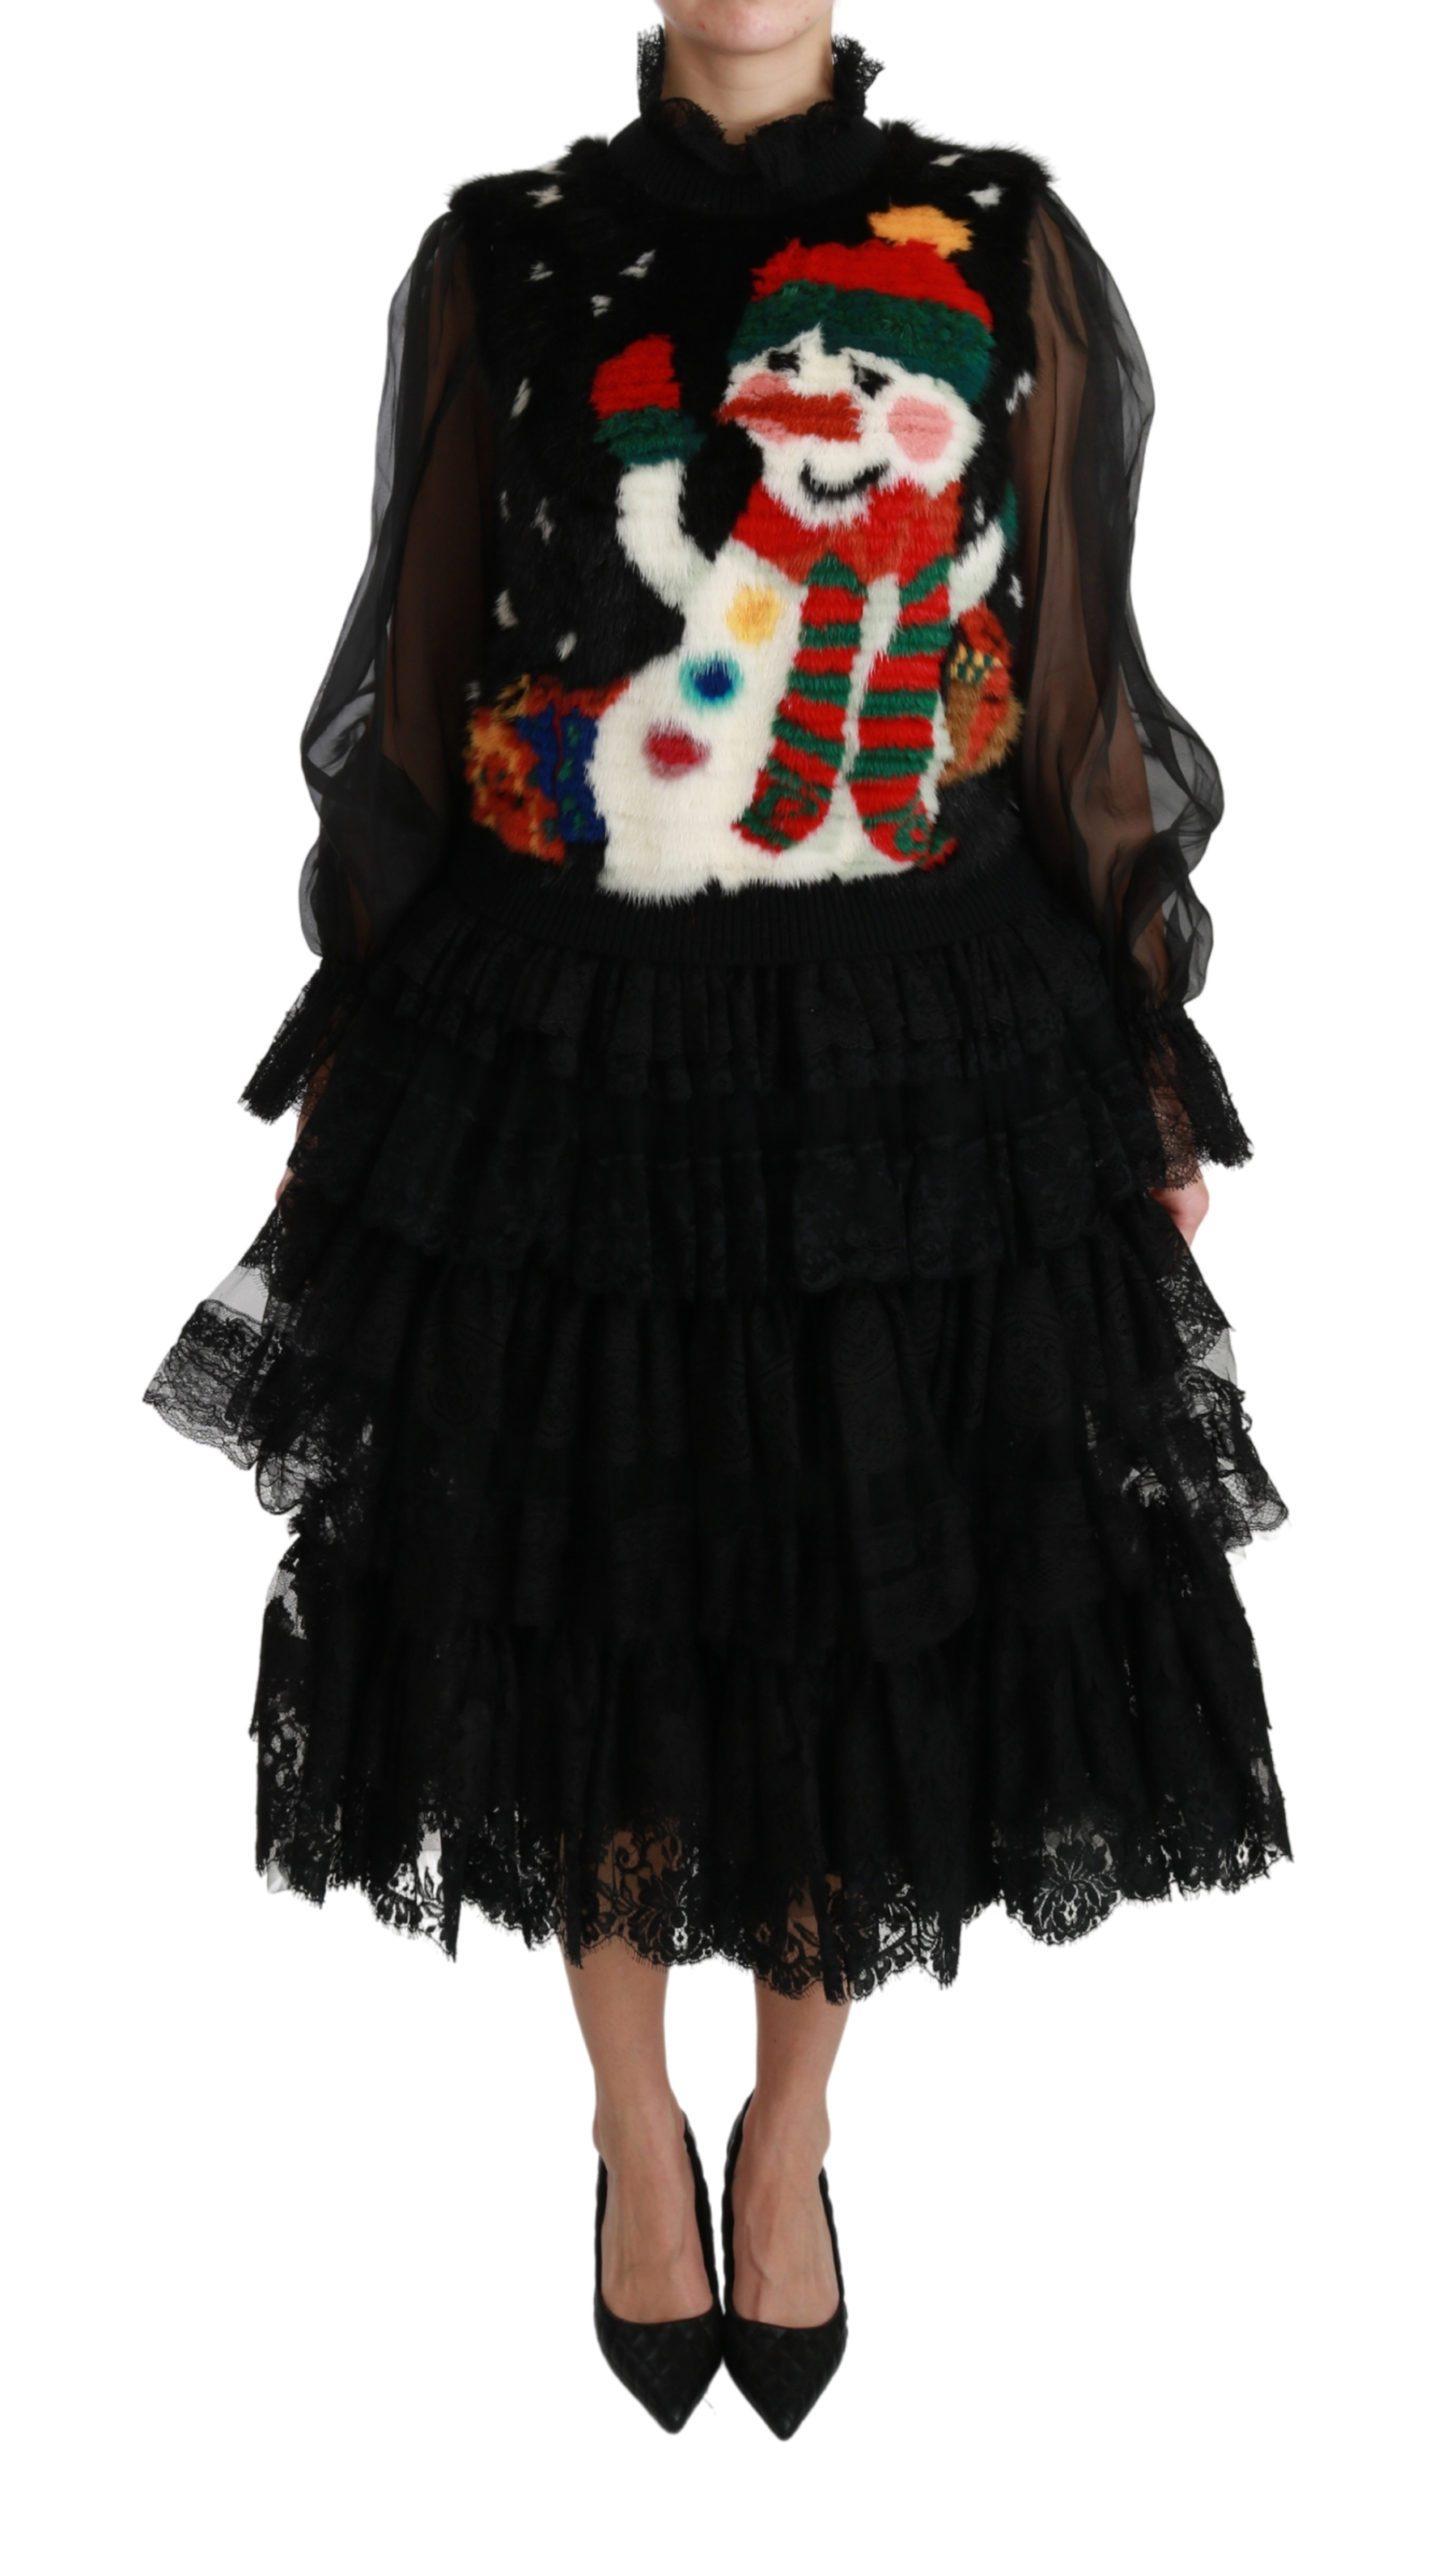 Dolce & Gabbana Women's Snowman Lace Layered Dress Black DR2509 - IT40 S